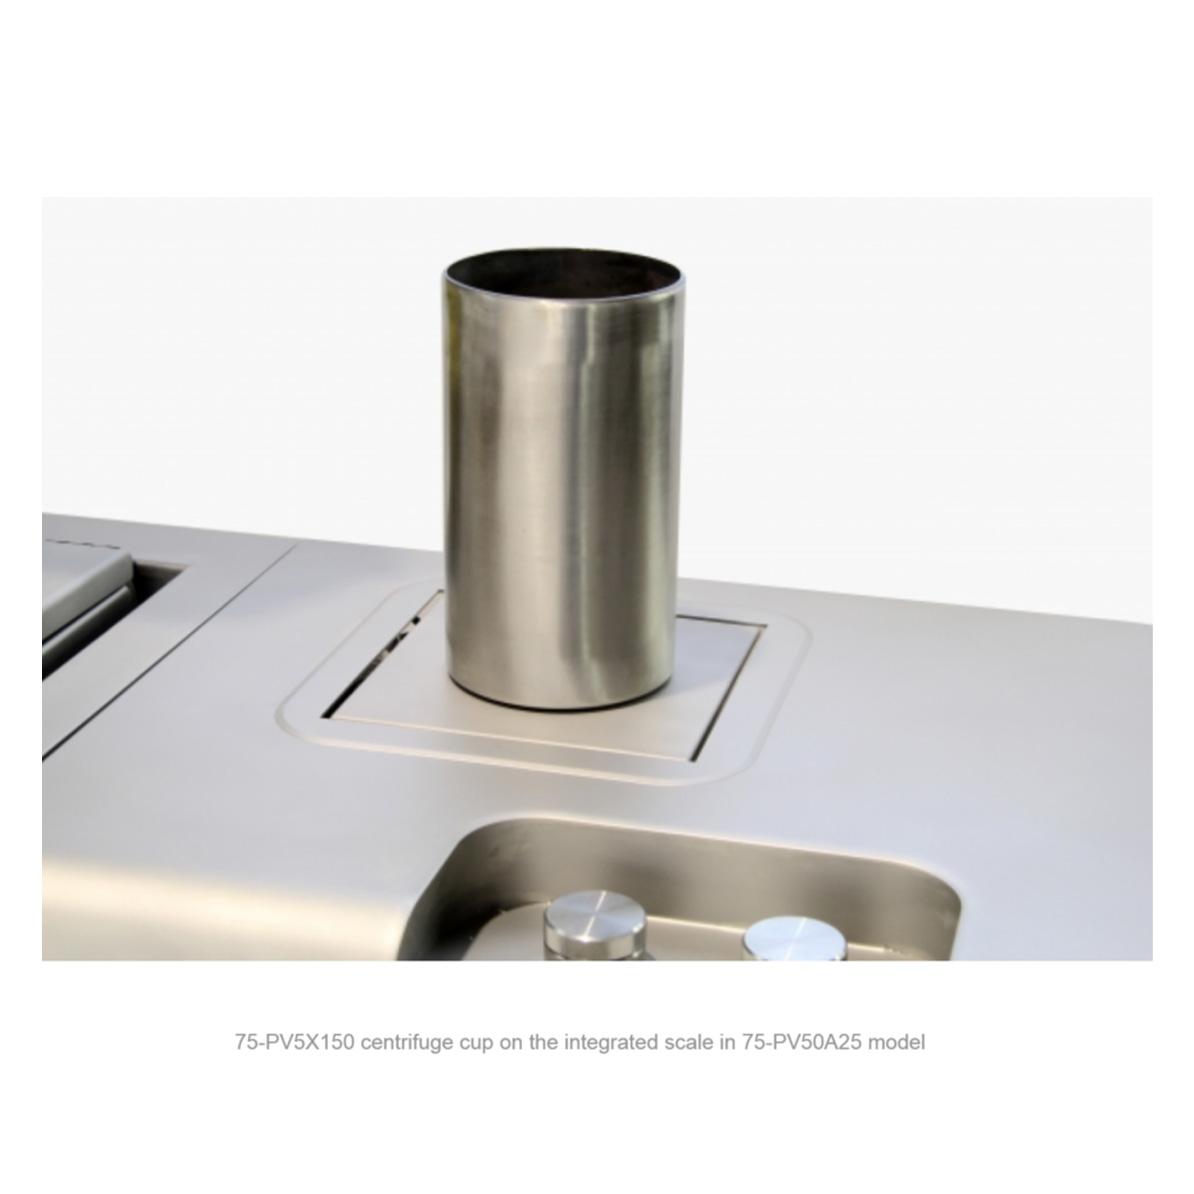 Hot mix asphalt automatic closed loop extractor PAVELAB50